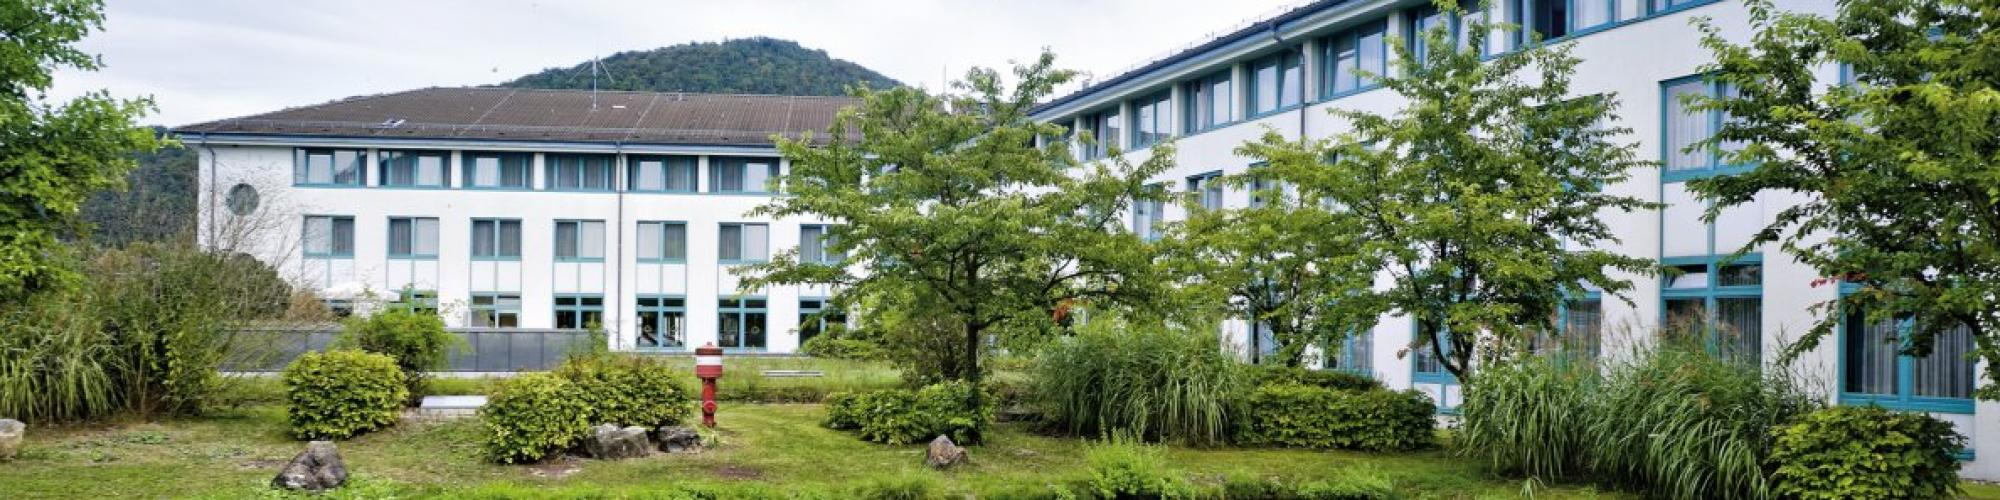 MEDICLIN GmbH & Co. KG